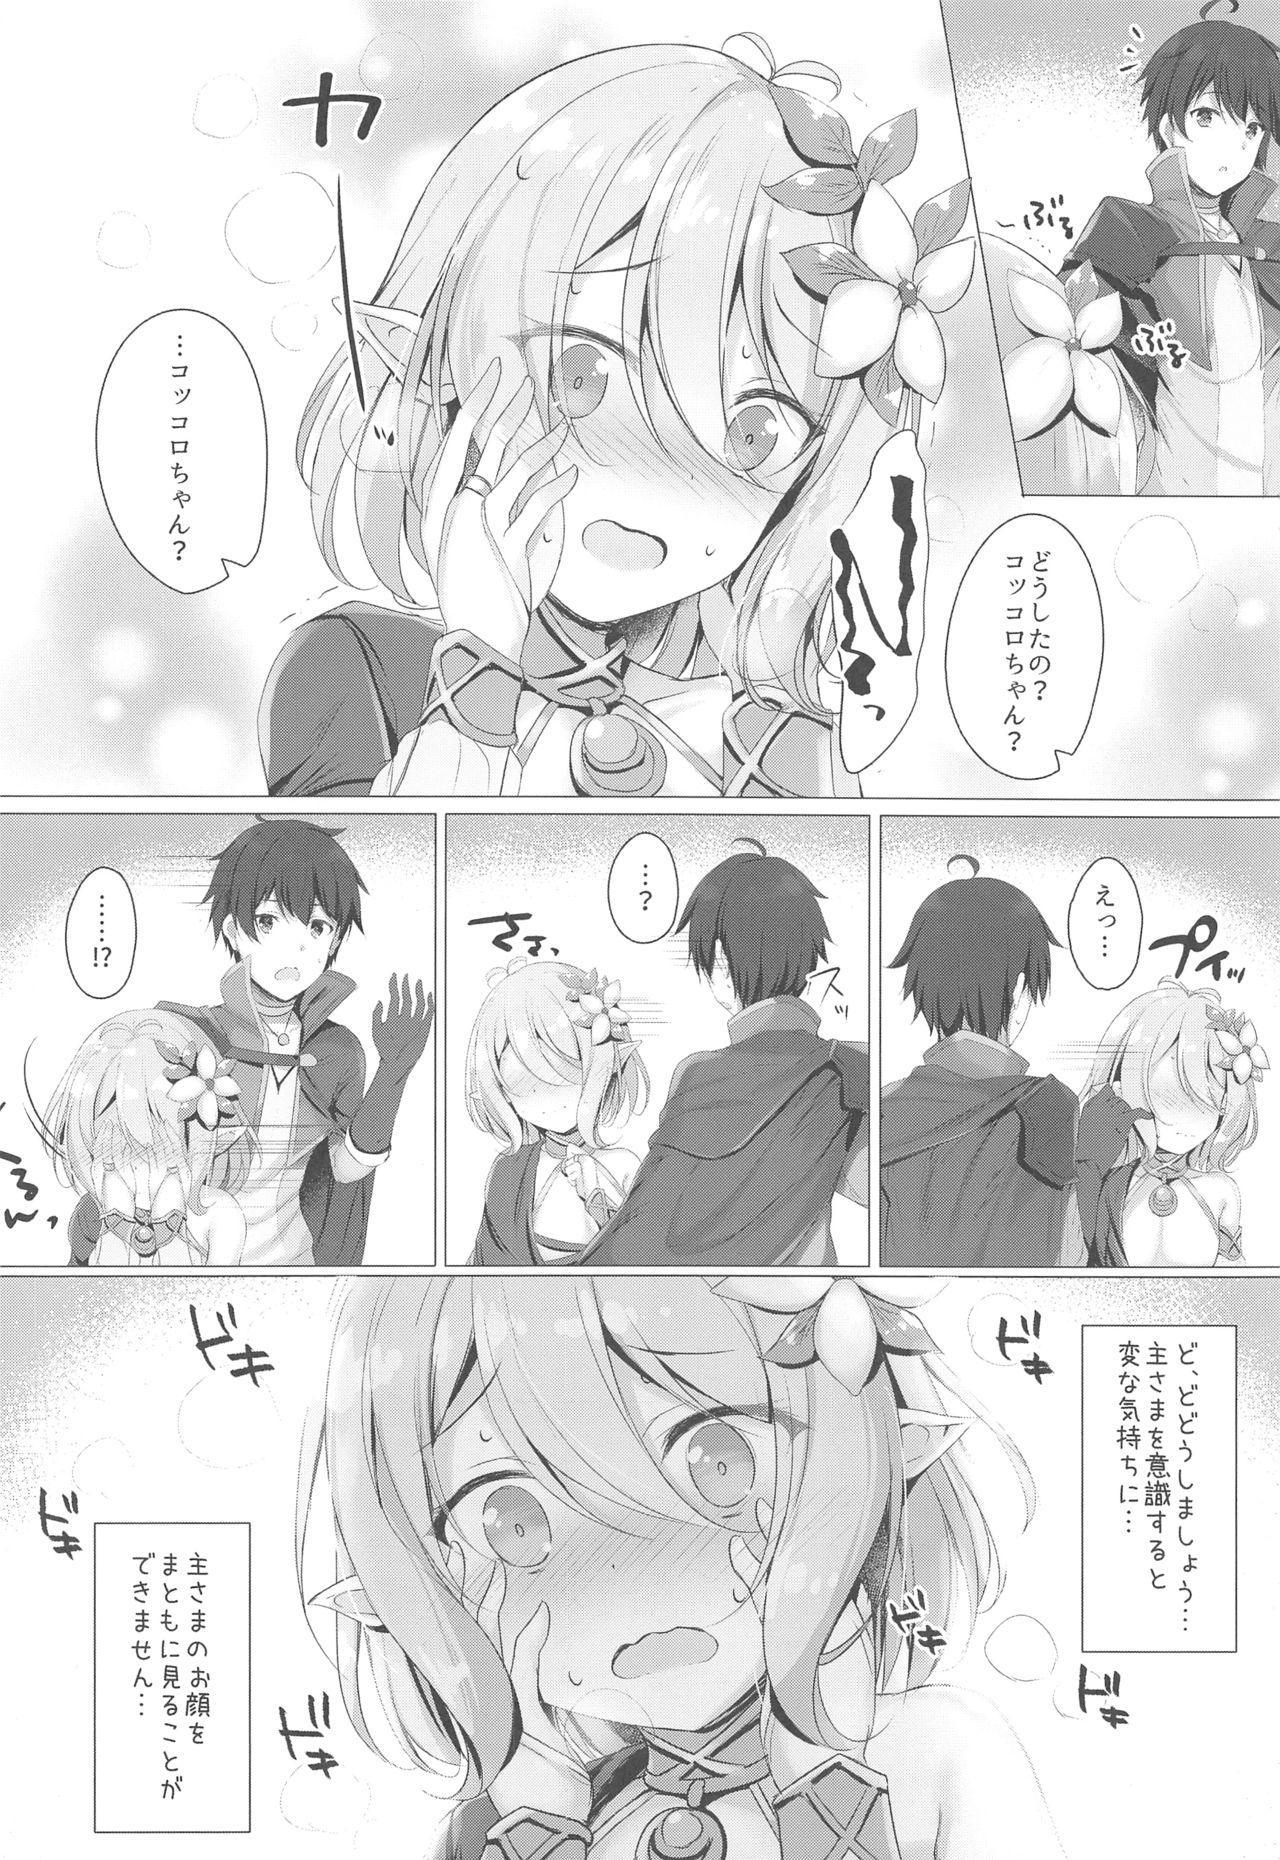 (C97) [Twilight Road (Tomo)] Kokkoro-chan to Connect Shitai! -Re:Dive‐ (Princess Connect! Re:Dive) 2